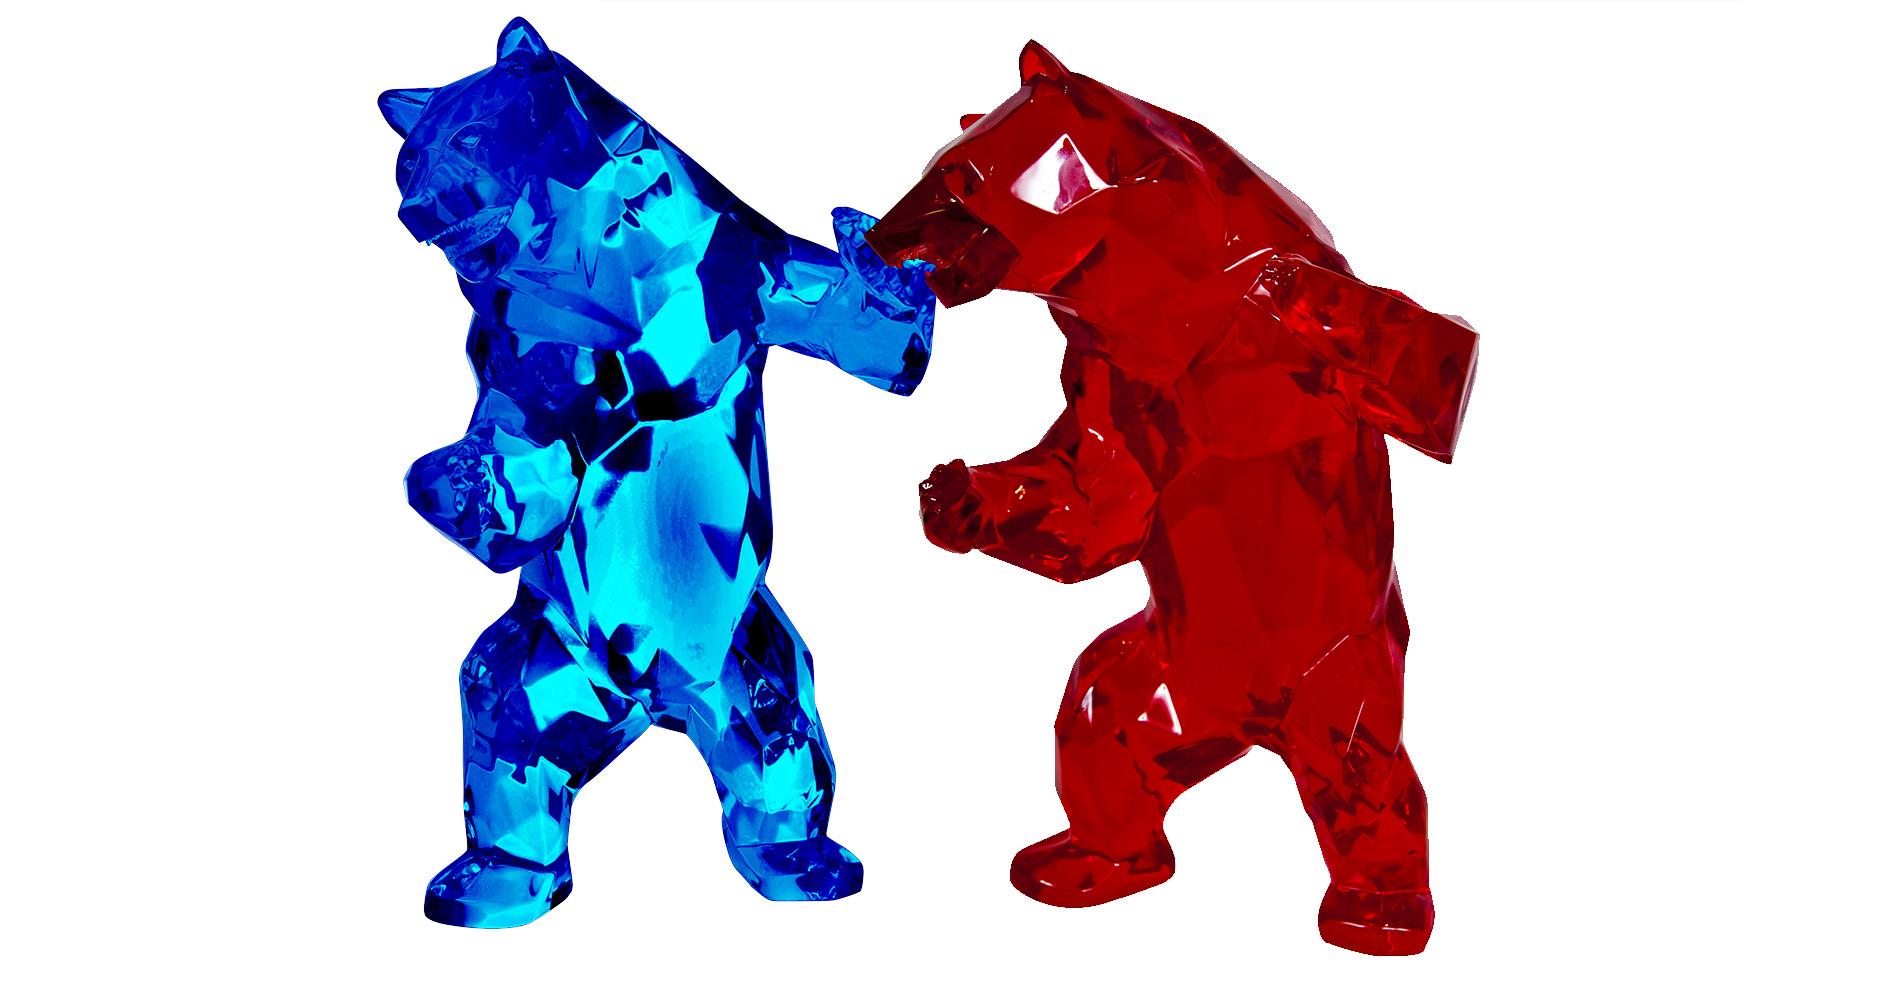 Standing Bear 2 by Richard Orlinski